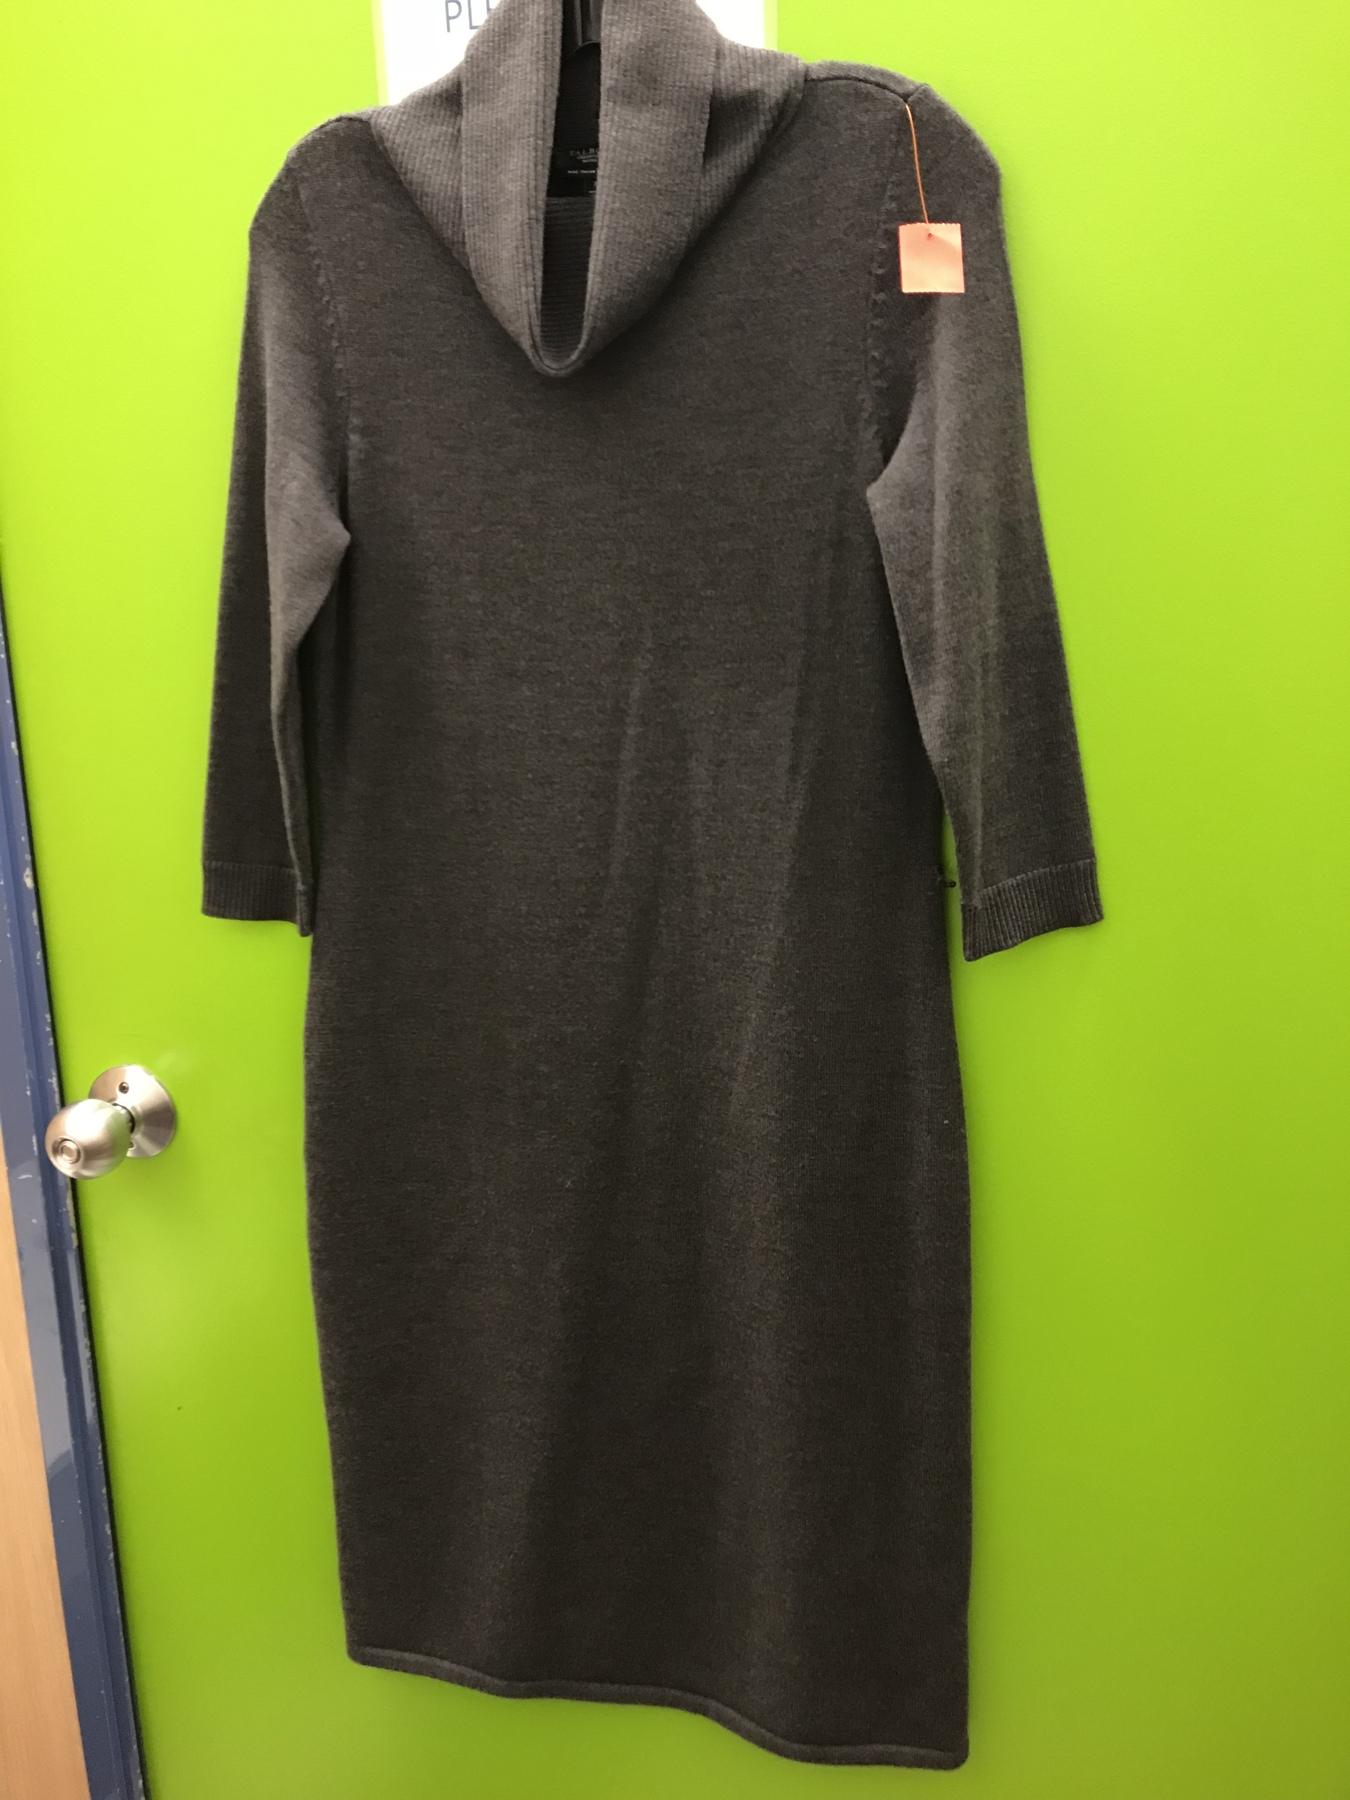 Talbots sweater dress found at goodwill